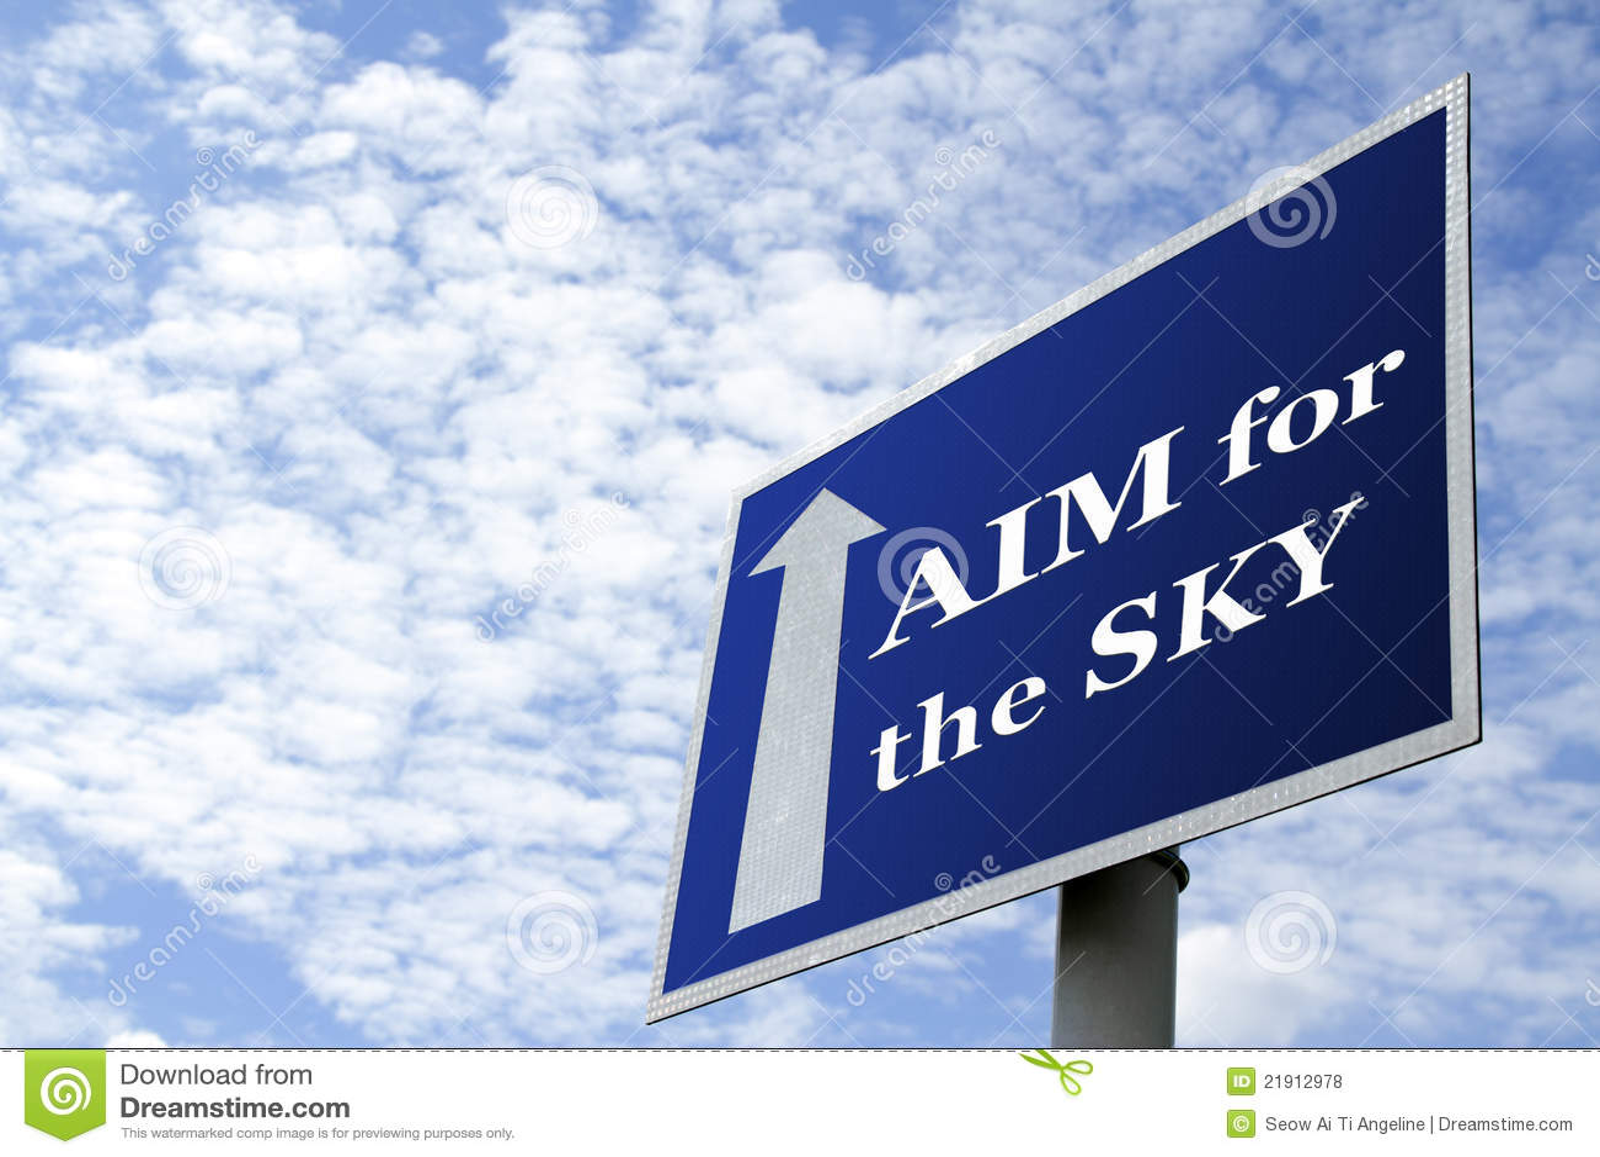 Dream Big! Aim High! Go for the Highest Peak! Beat the